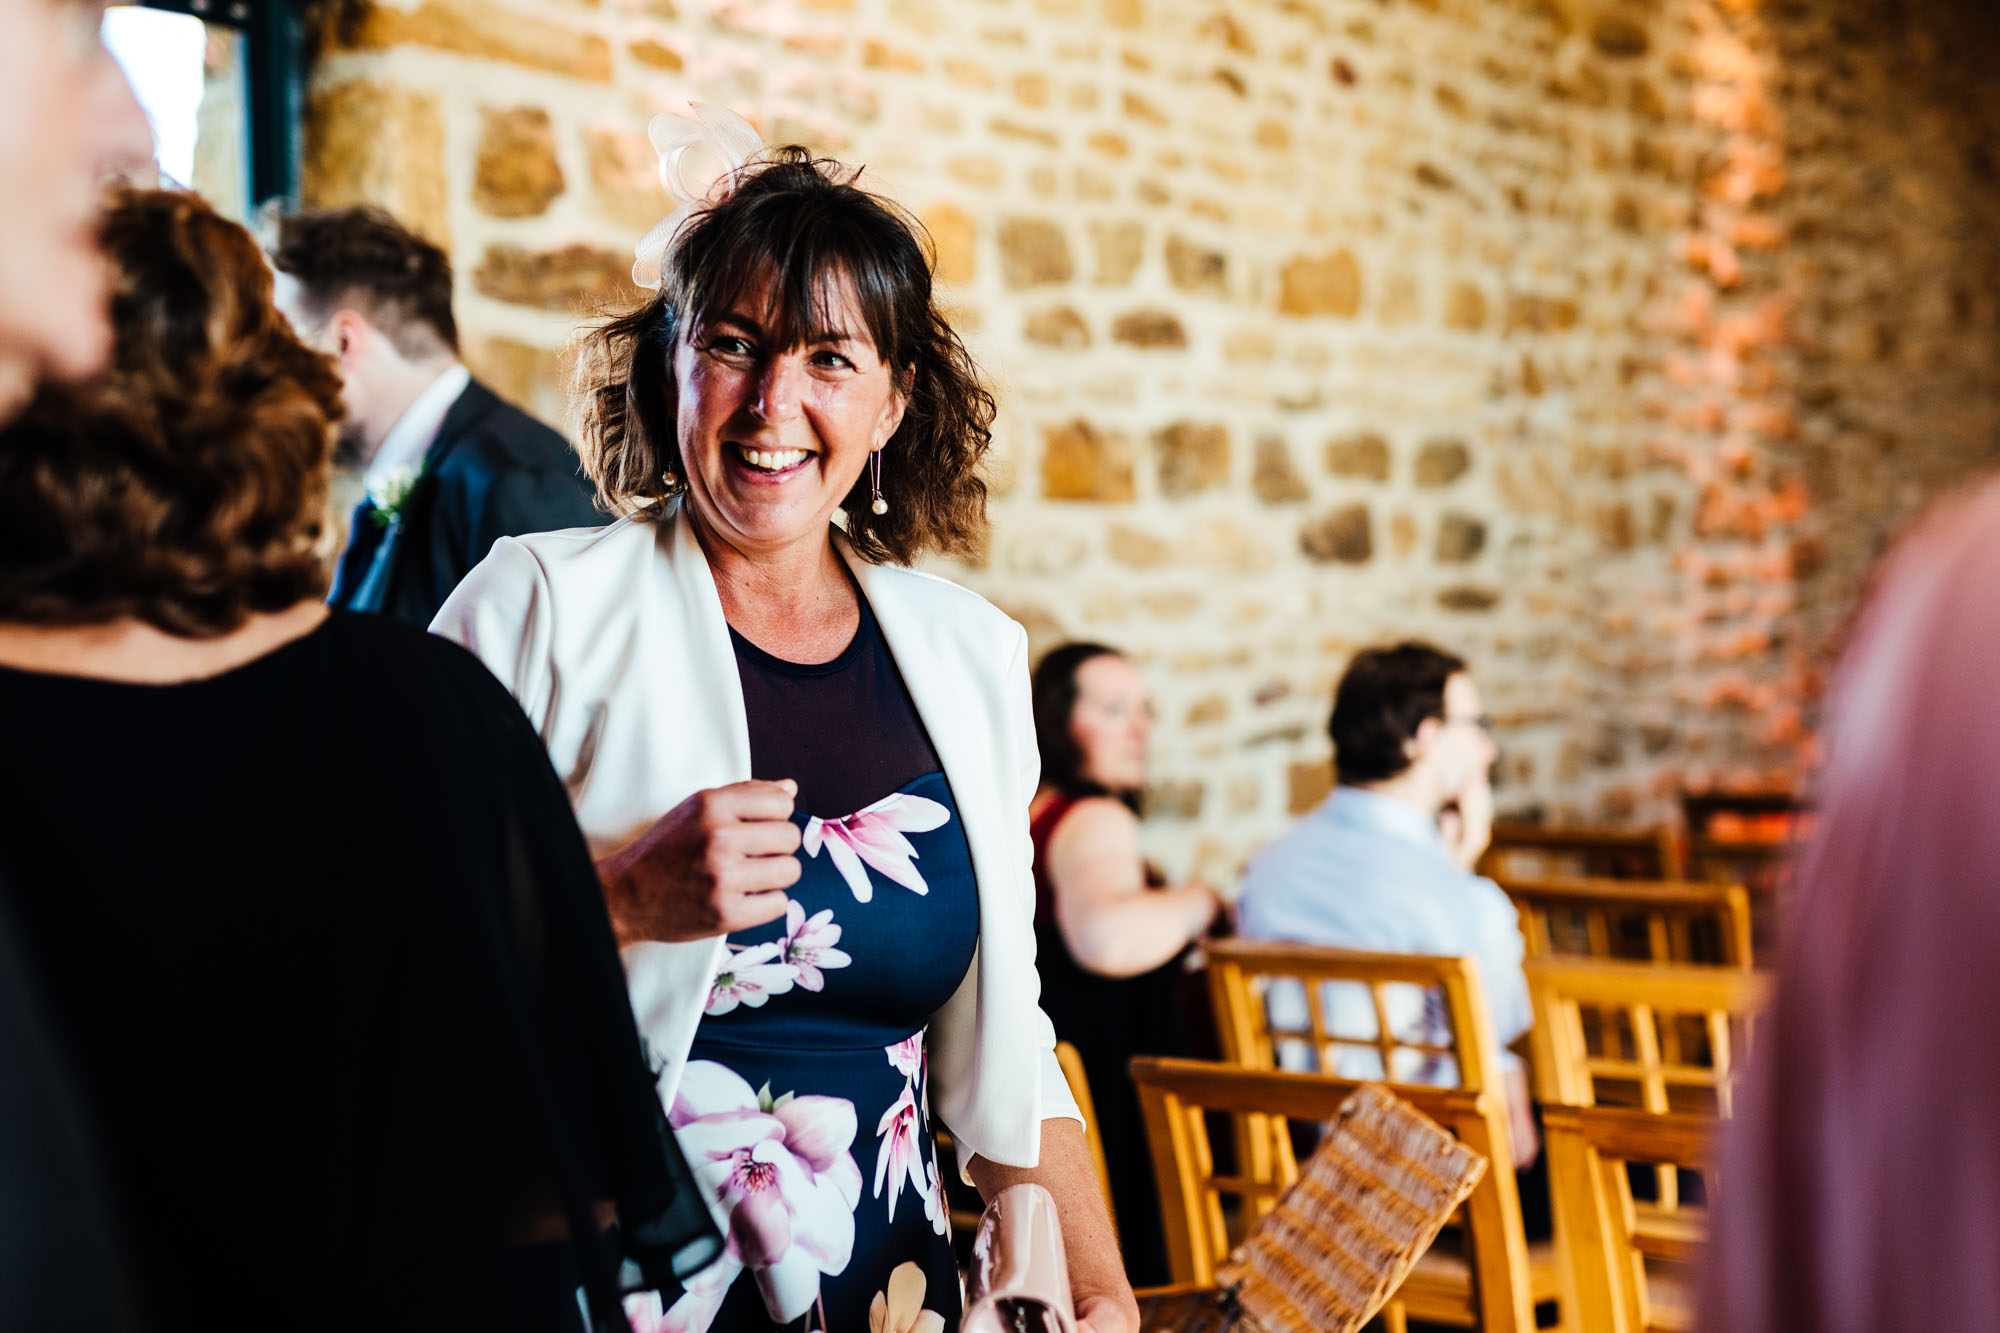 wedding-at-dodford-manor-28